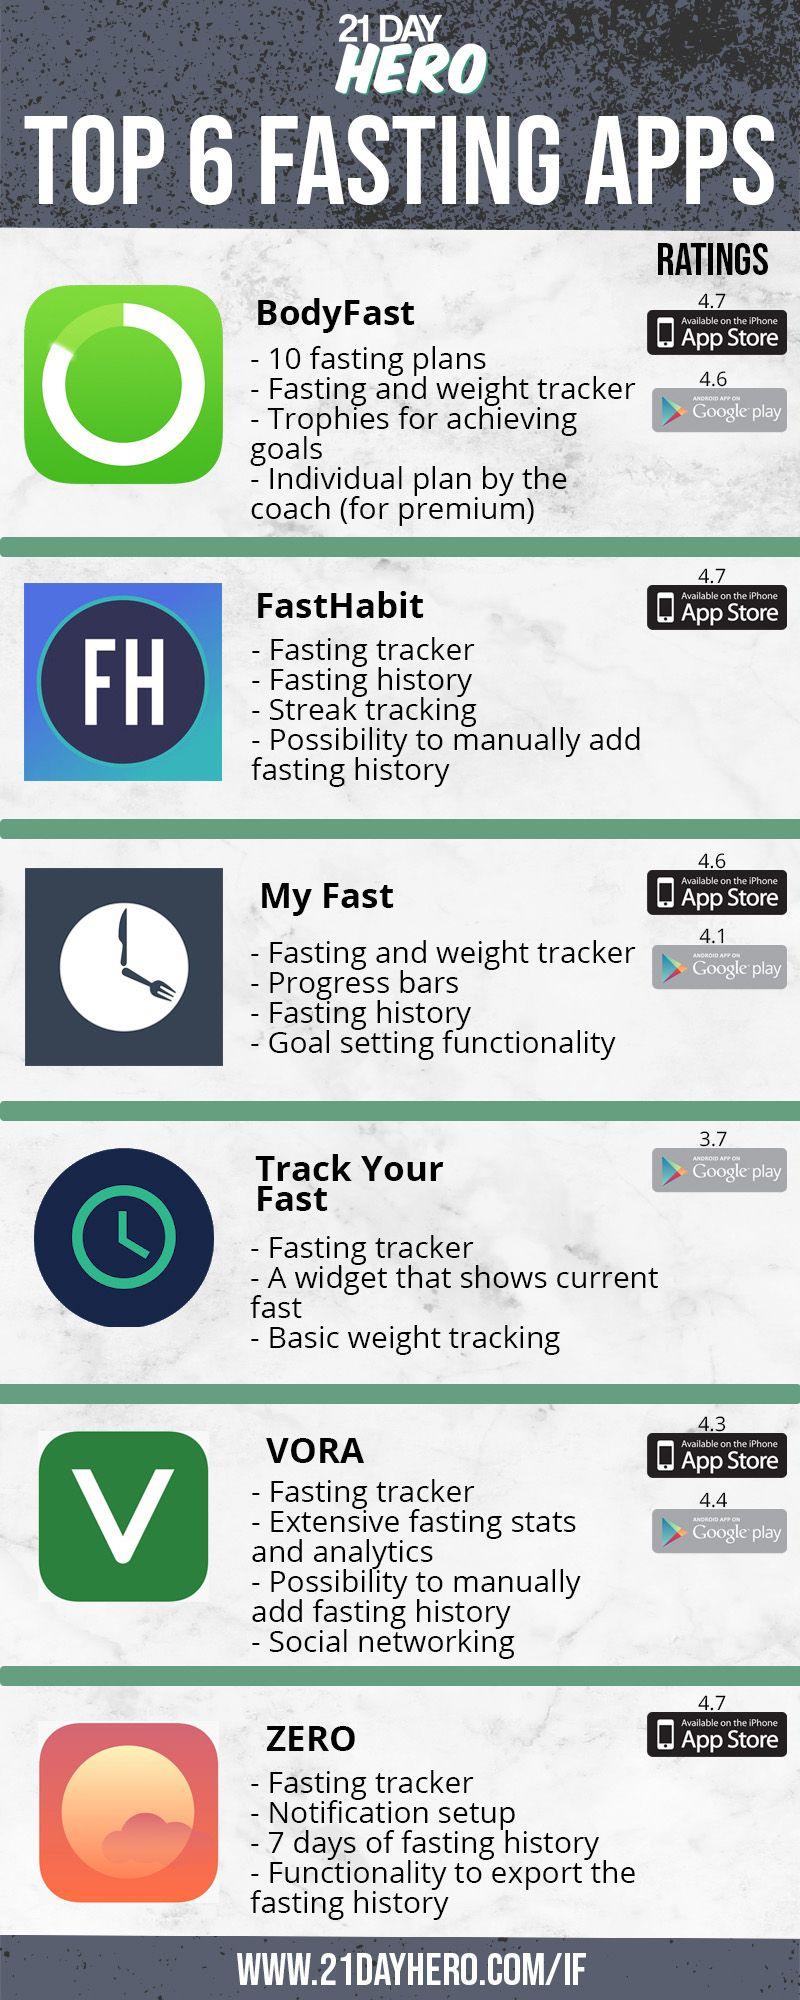 6 free premium intermittent fasting apps 2021 update